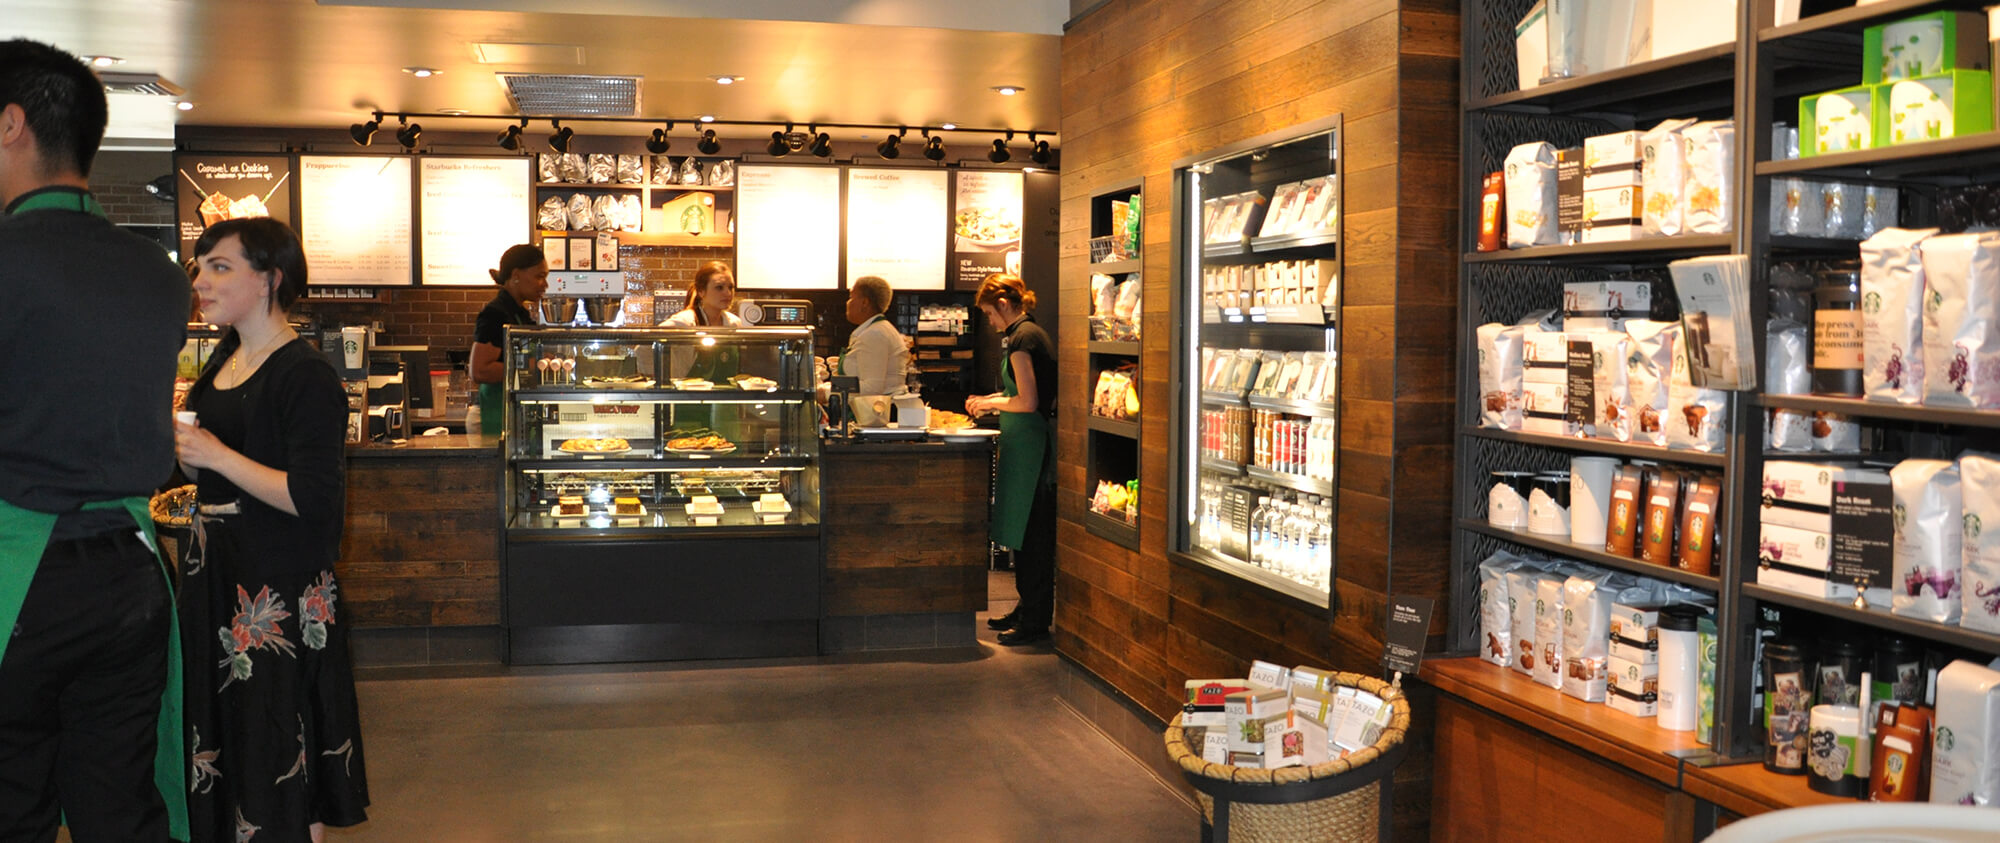 Starbucks Coffee | General Contractor, Construction Management | Portland Oregon, Seattle ...